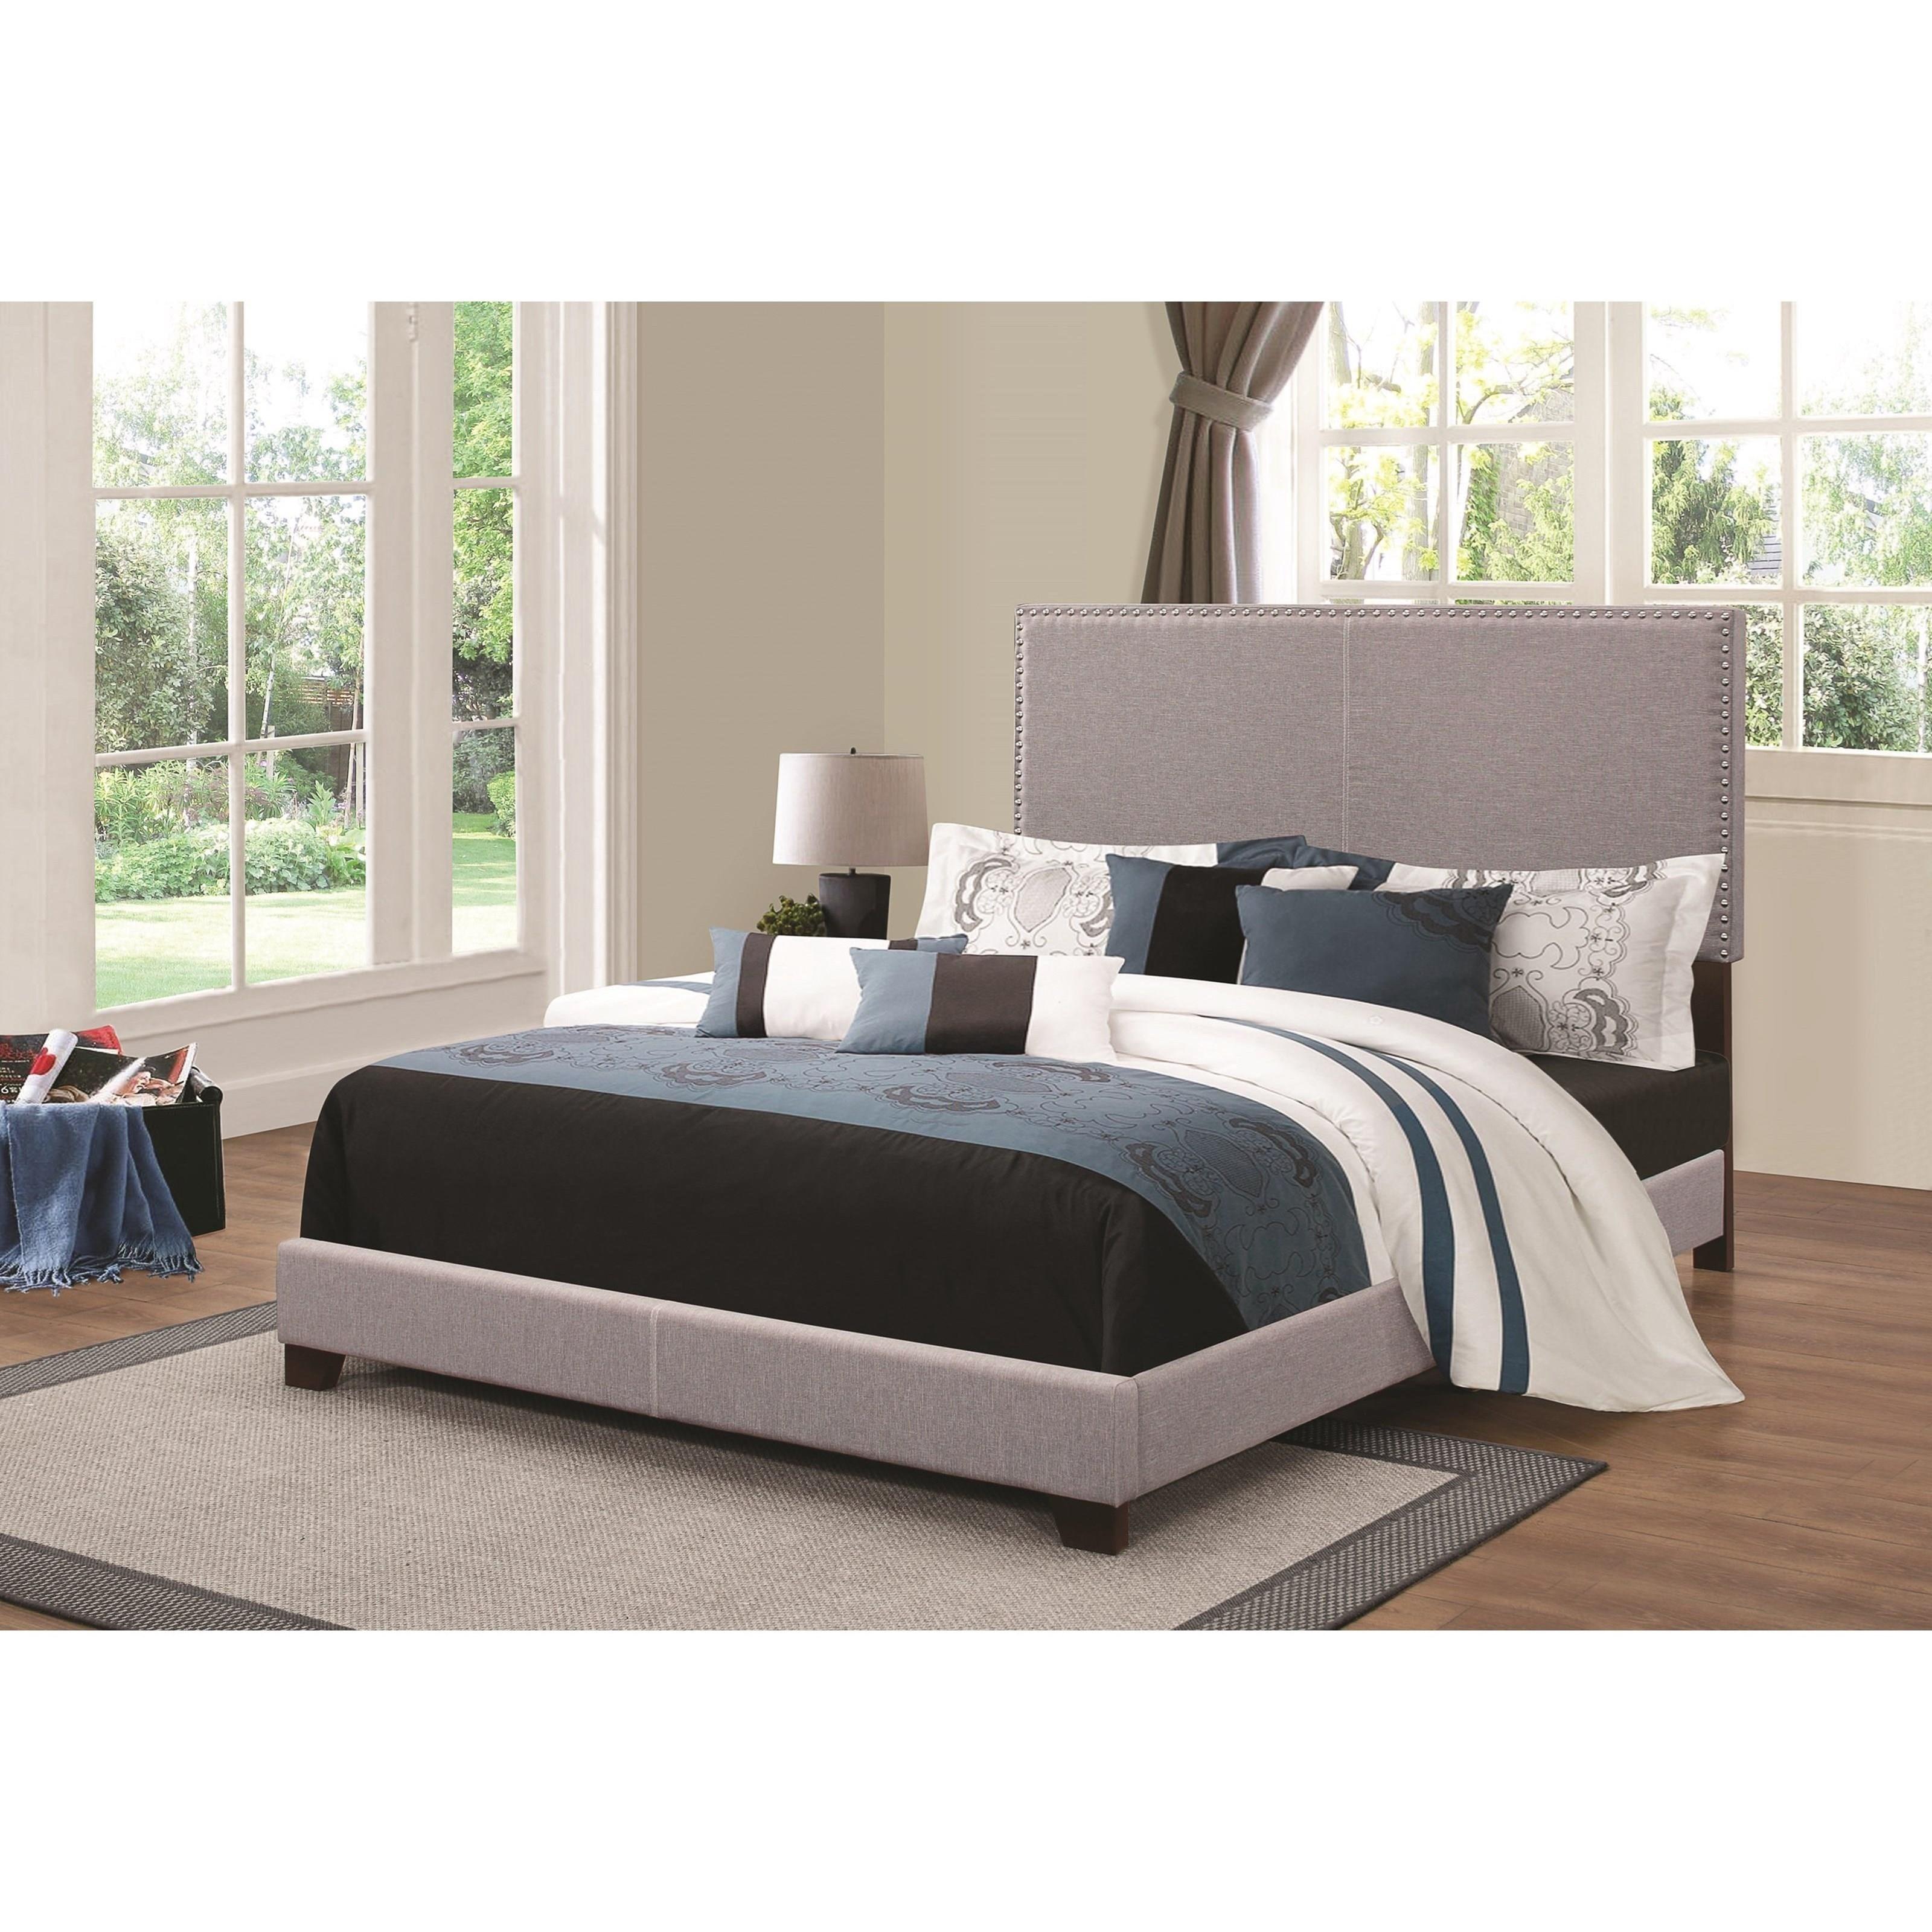 Coaster upholstered beds upholstered full bed with for Upholstered full bed